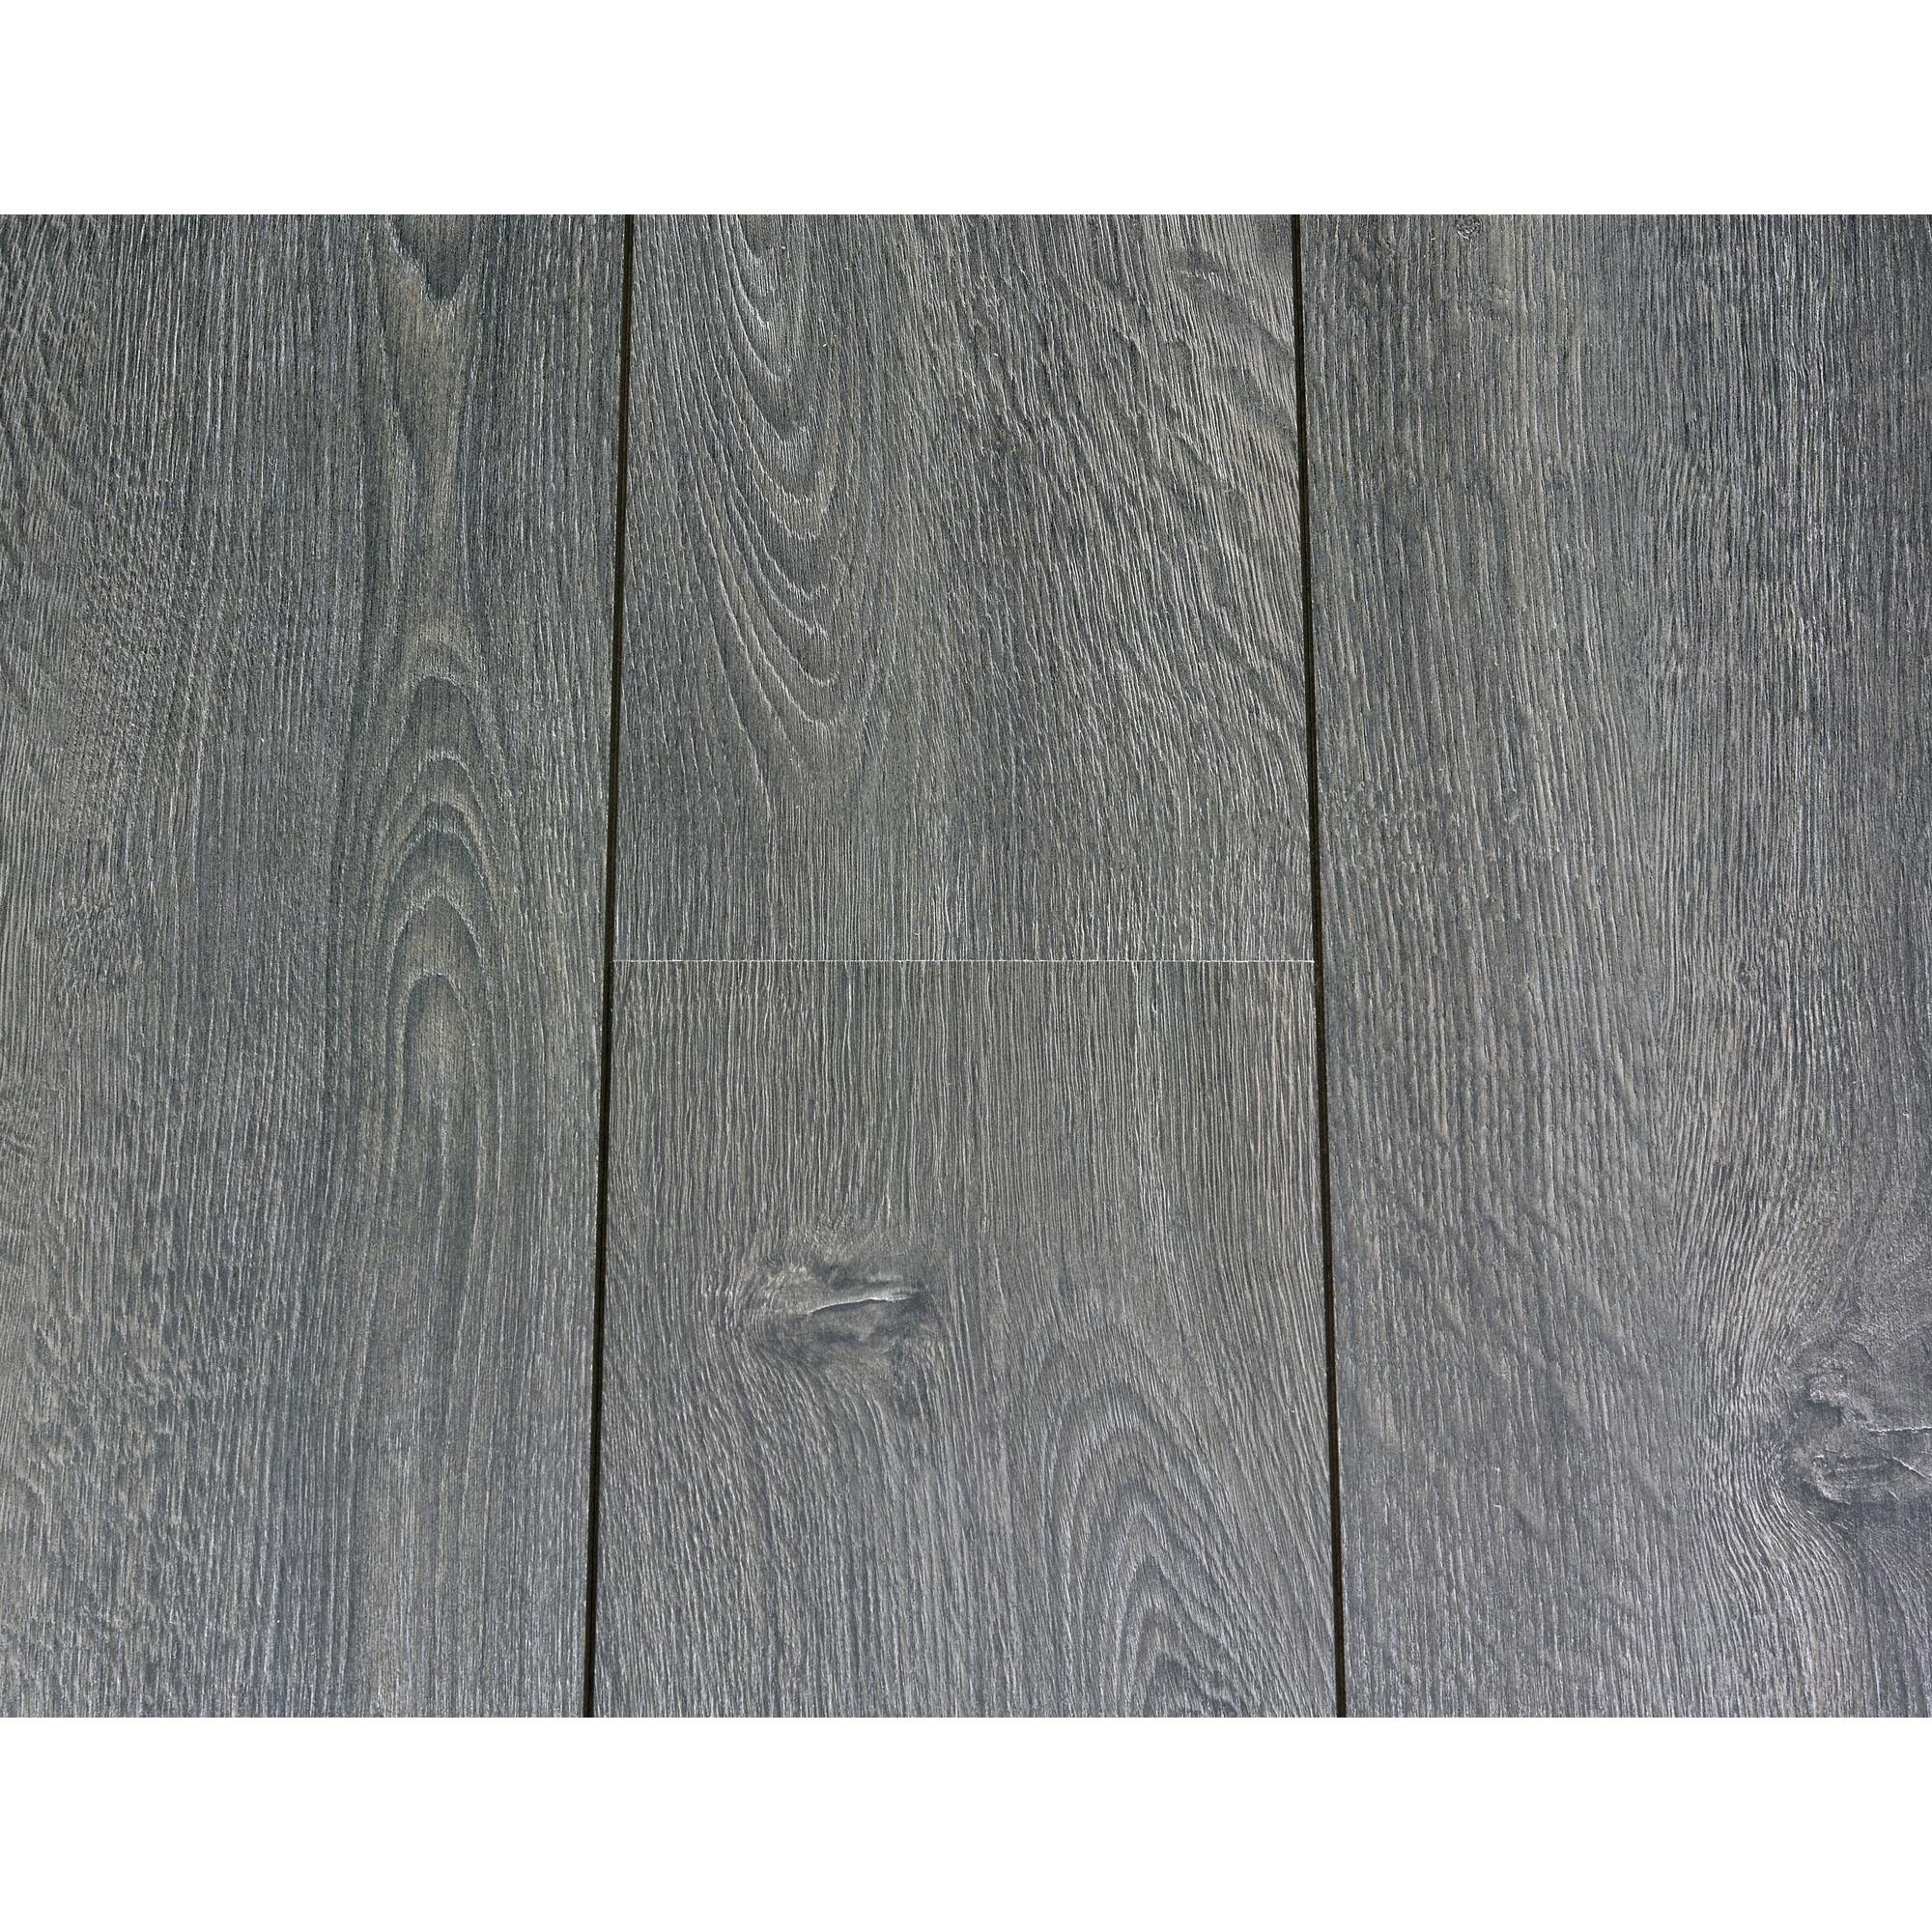 Vita New Classic laminaat donker grijs eiken V groef 1,86 m u00b2   Alle vloeren   Vloeren   KARWEI